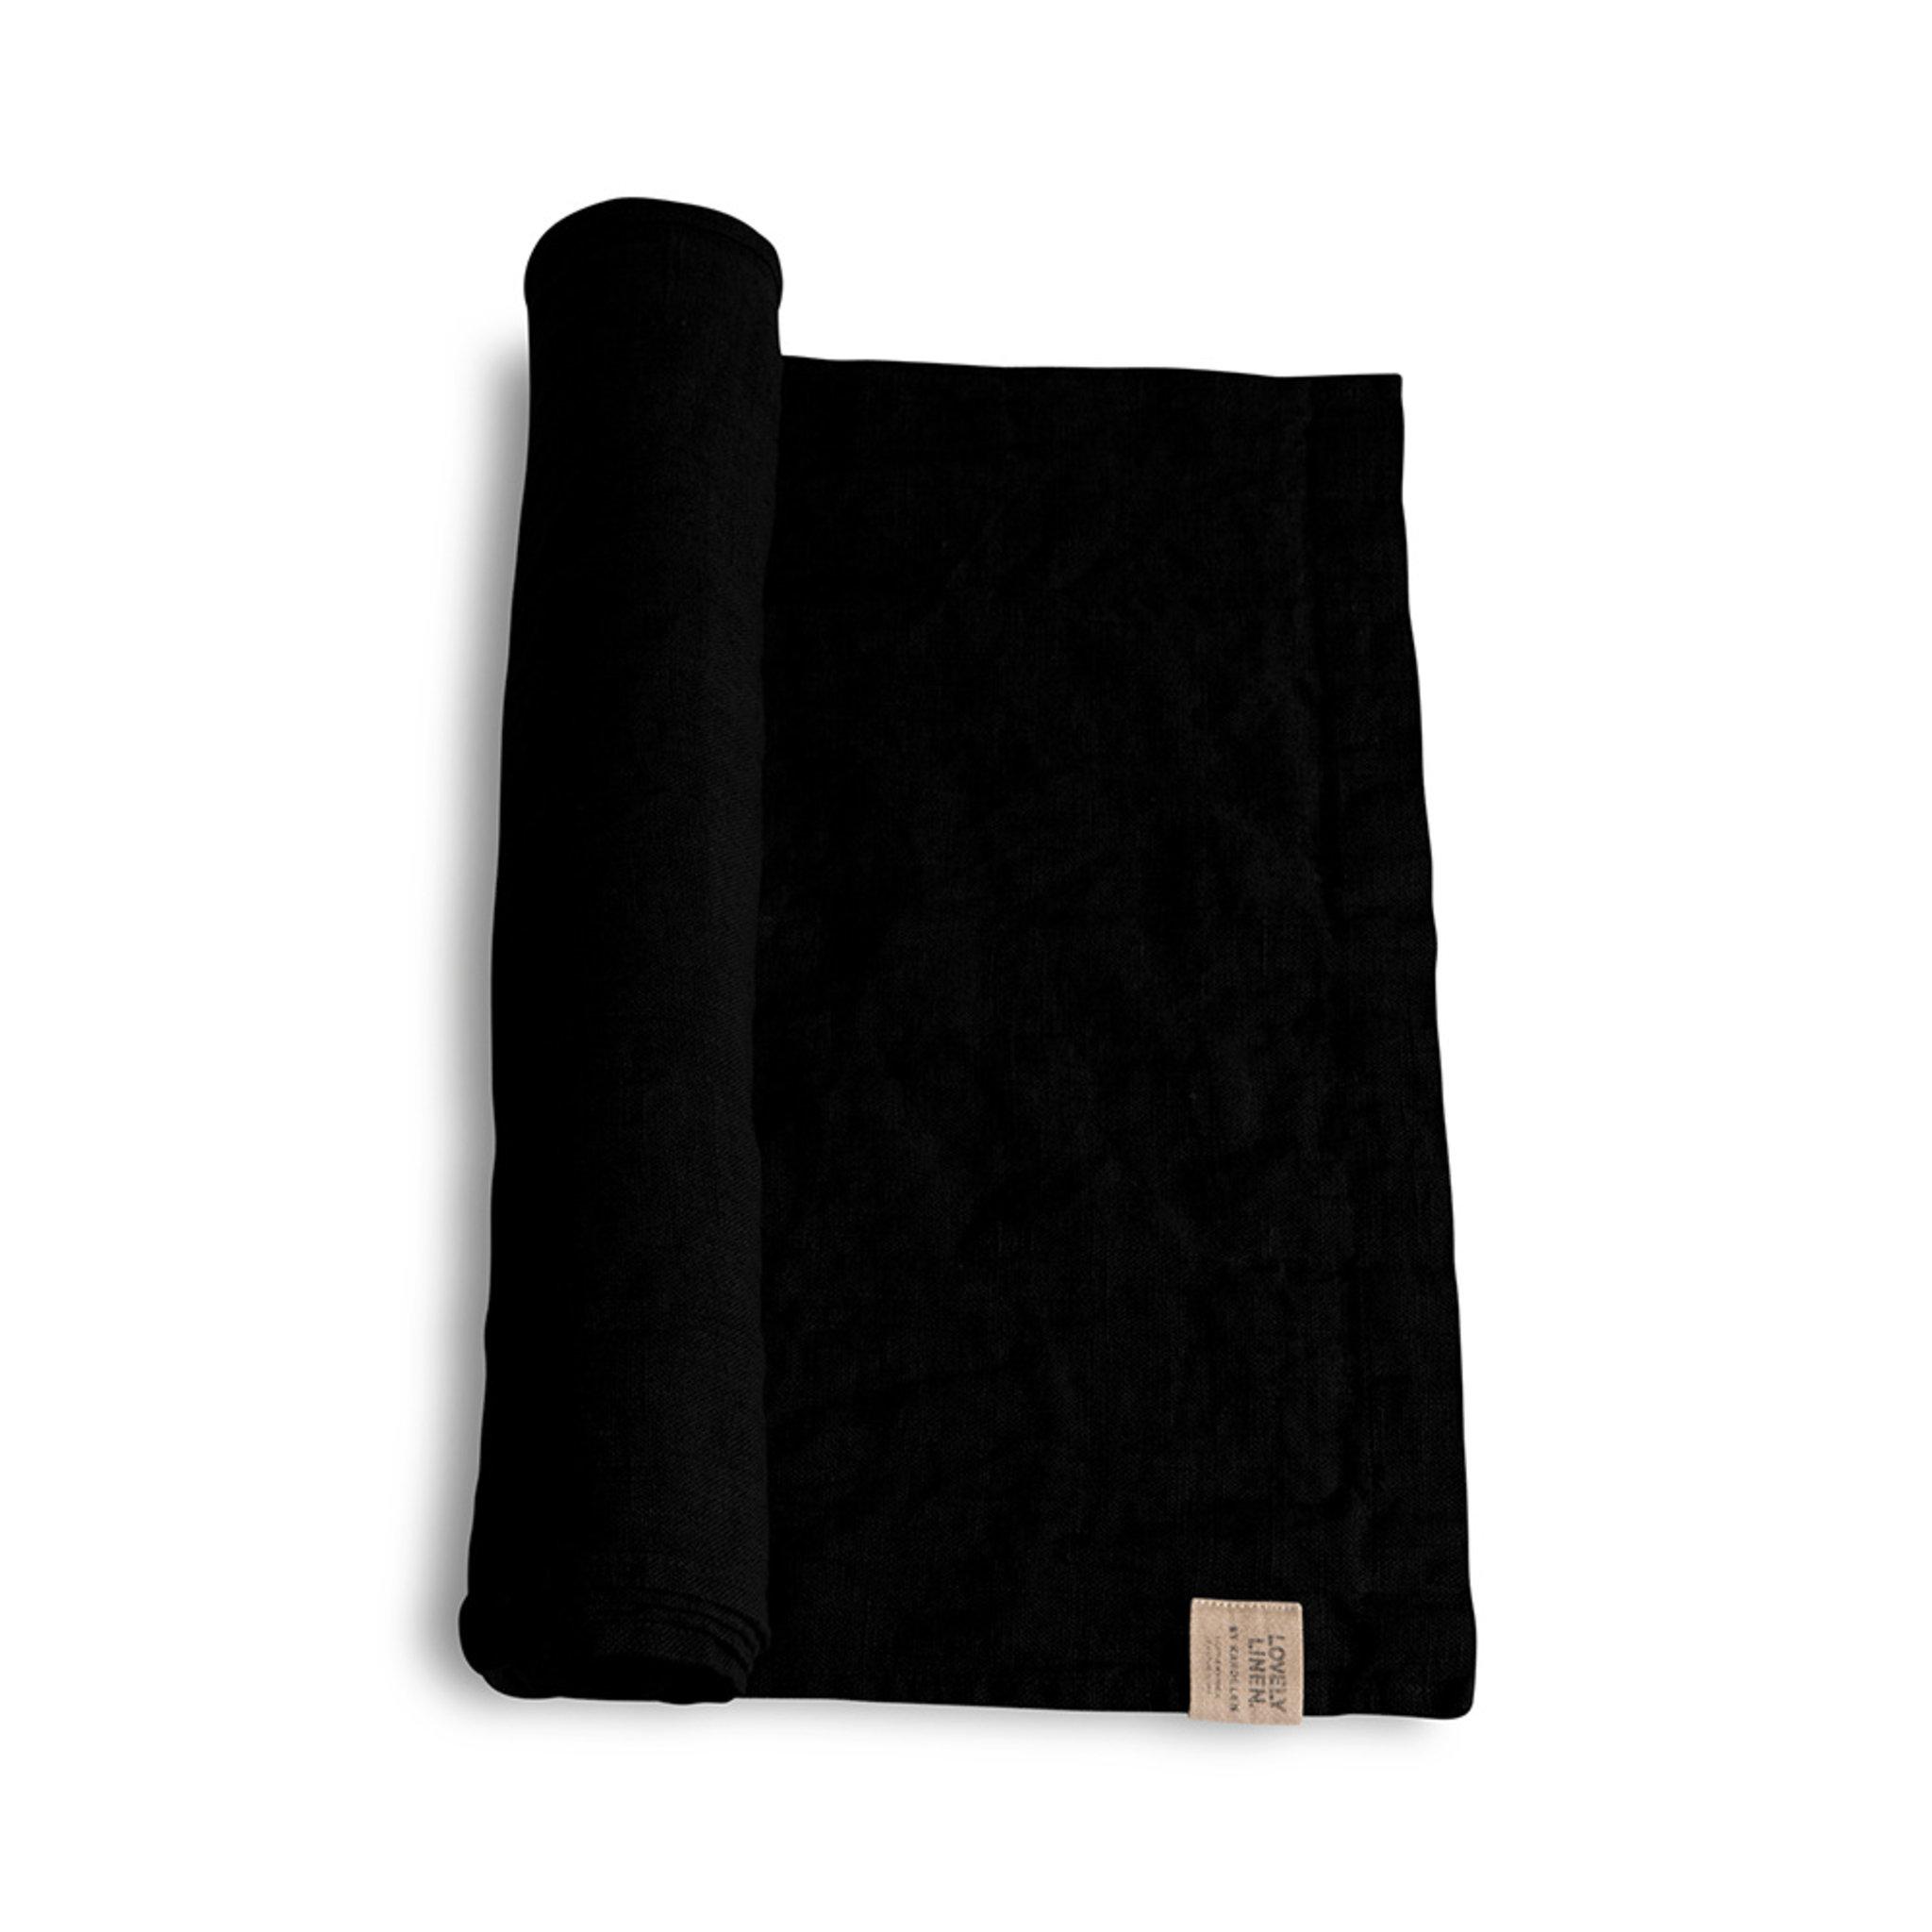 Löpare 45 x 150 cm Black